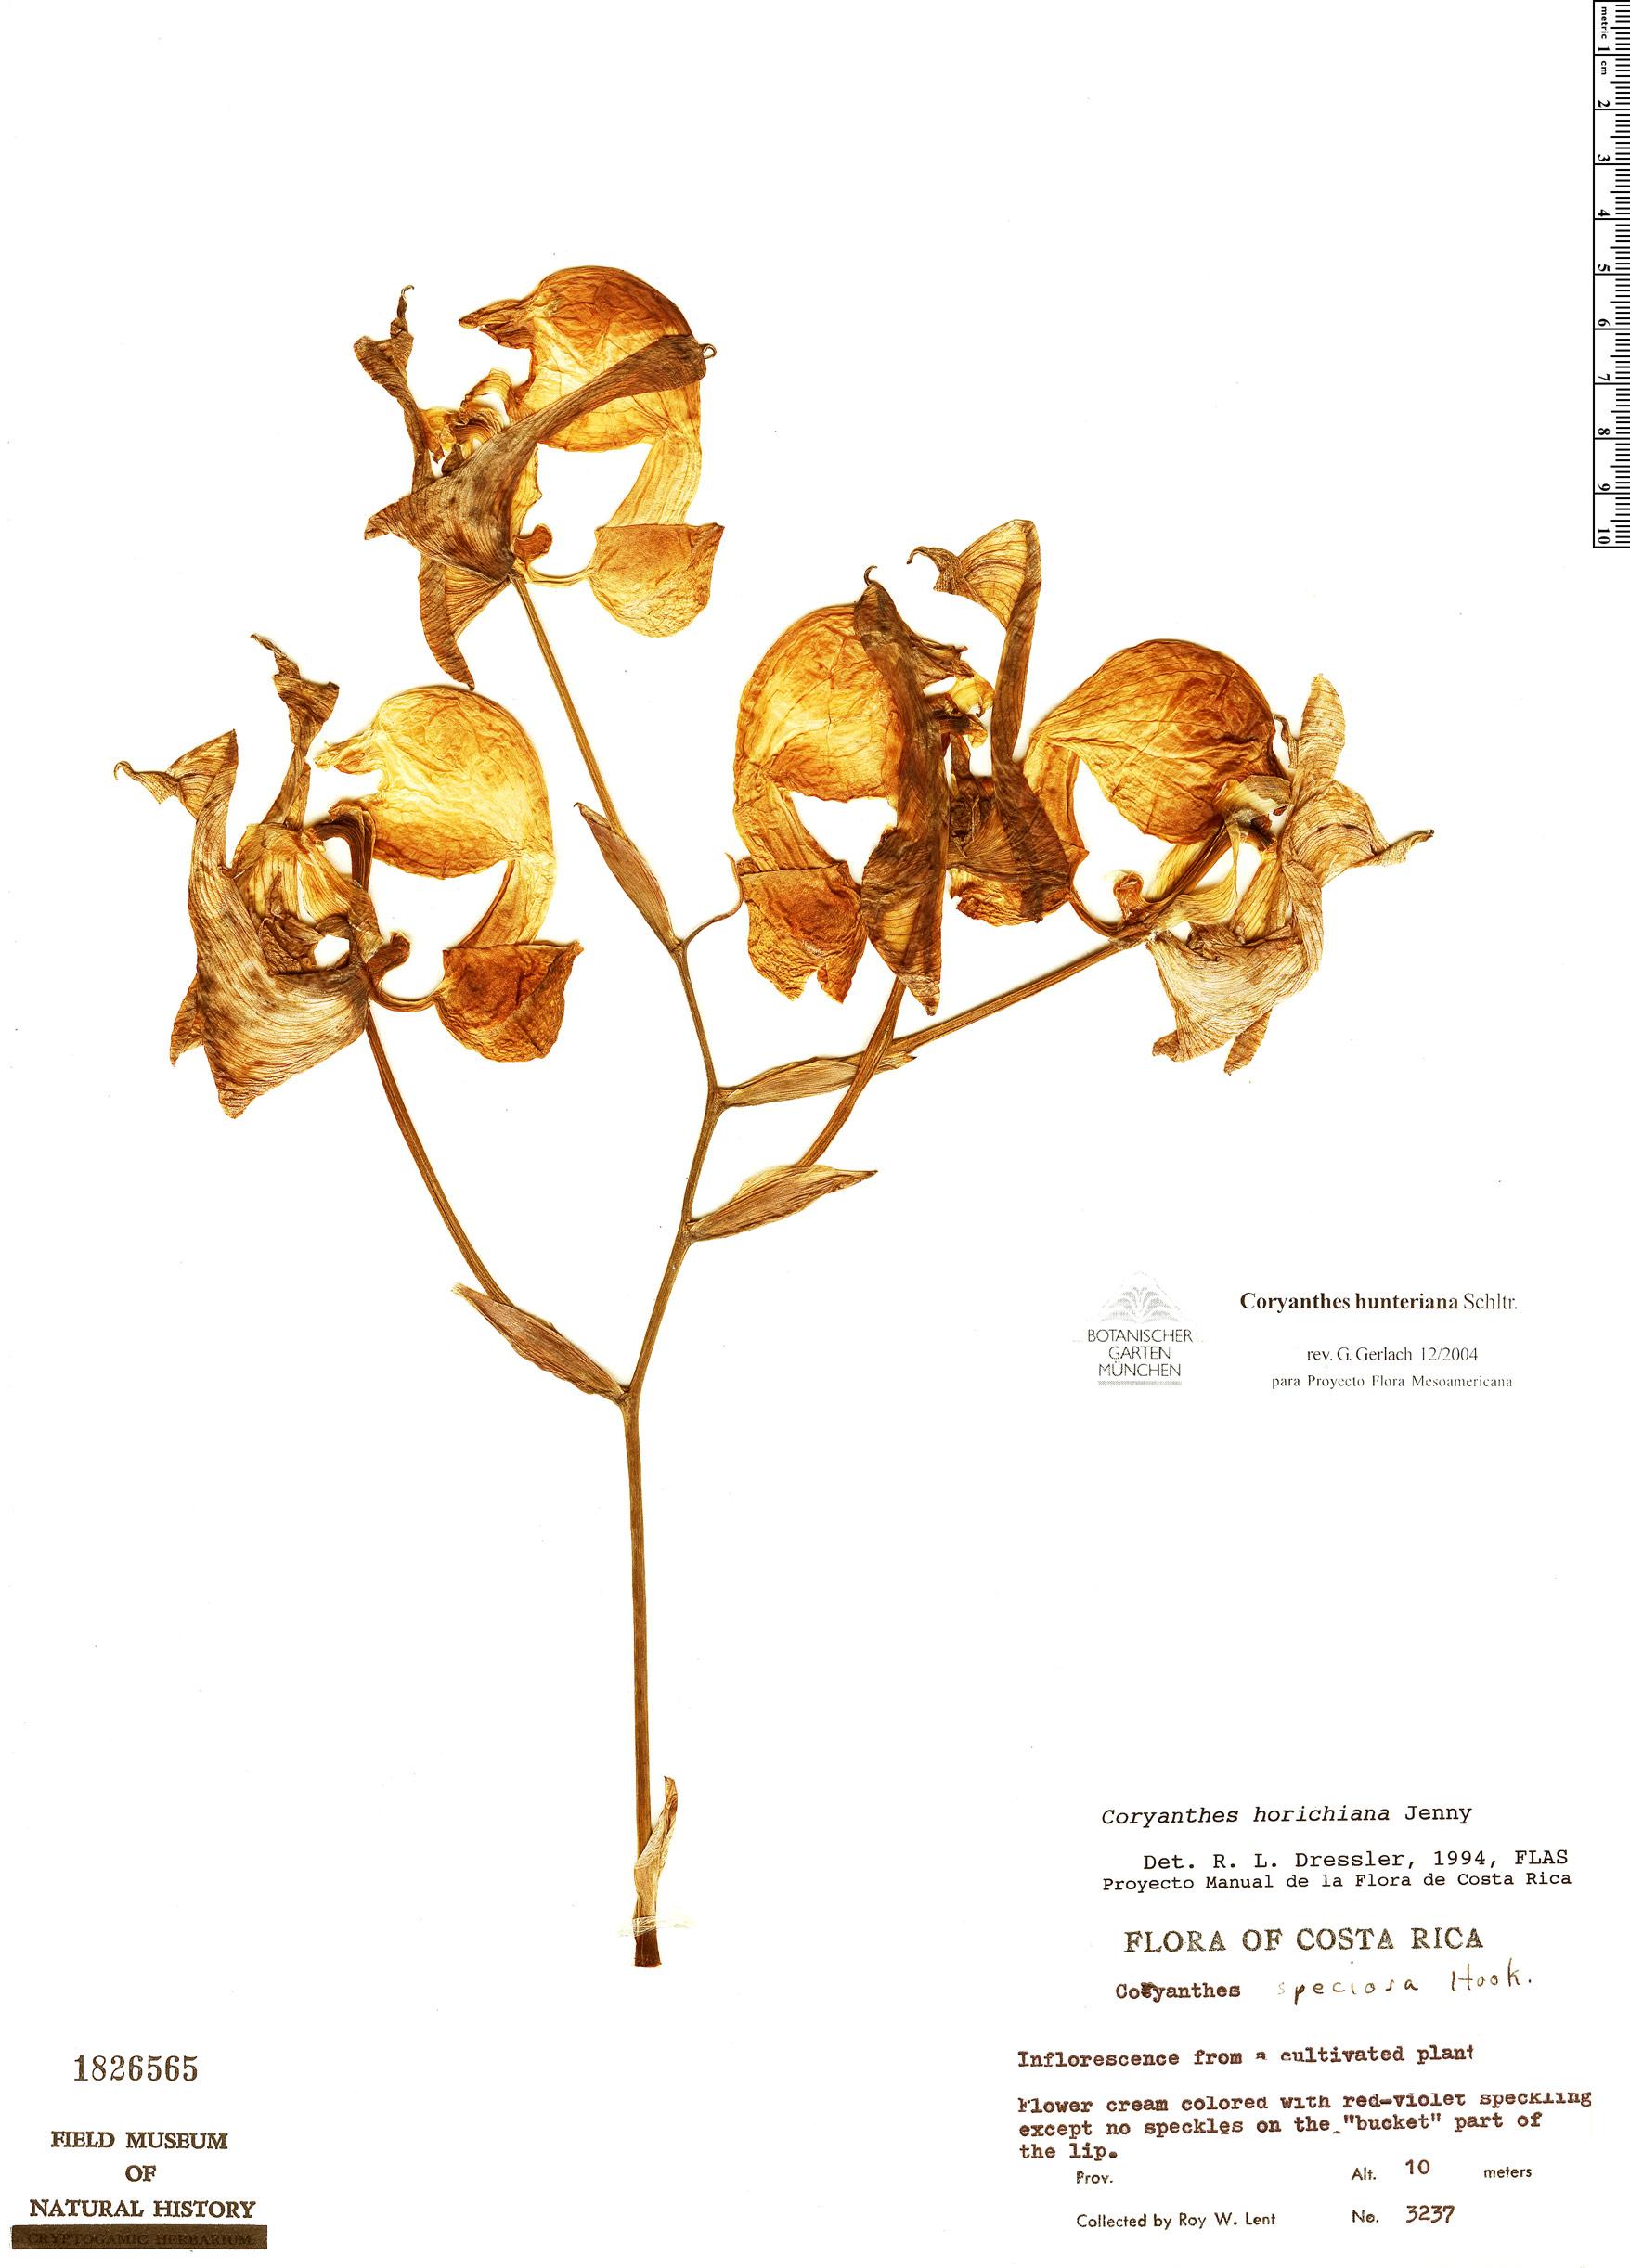 Specimen: Coryanthes hunteriana